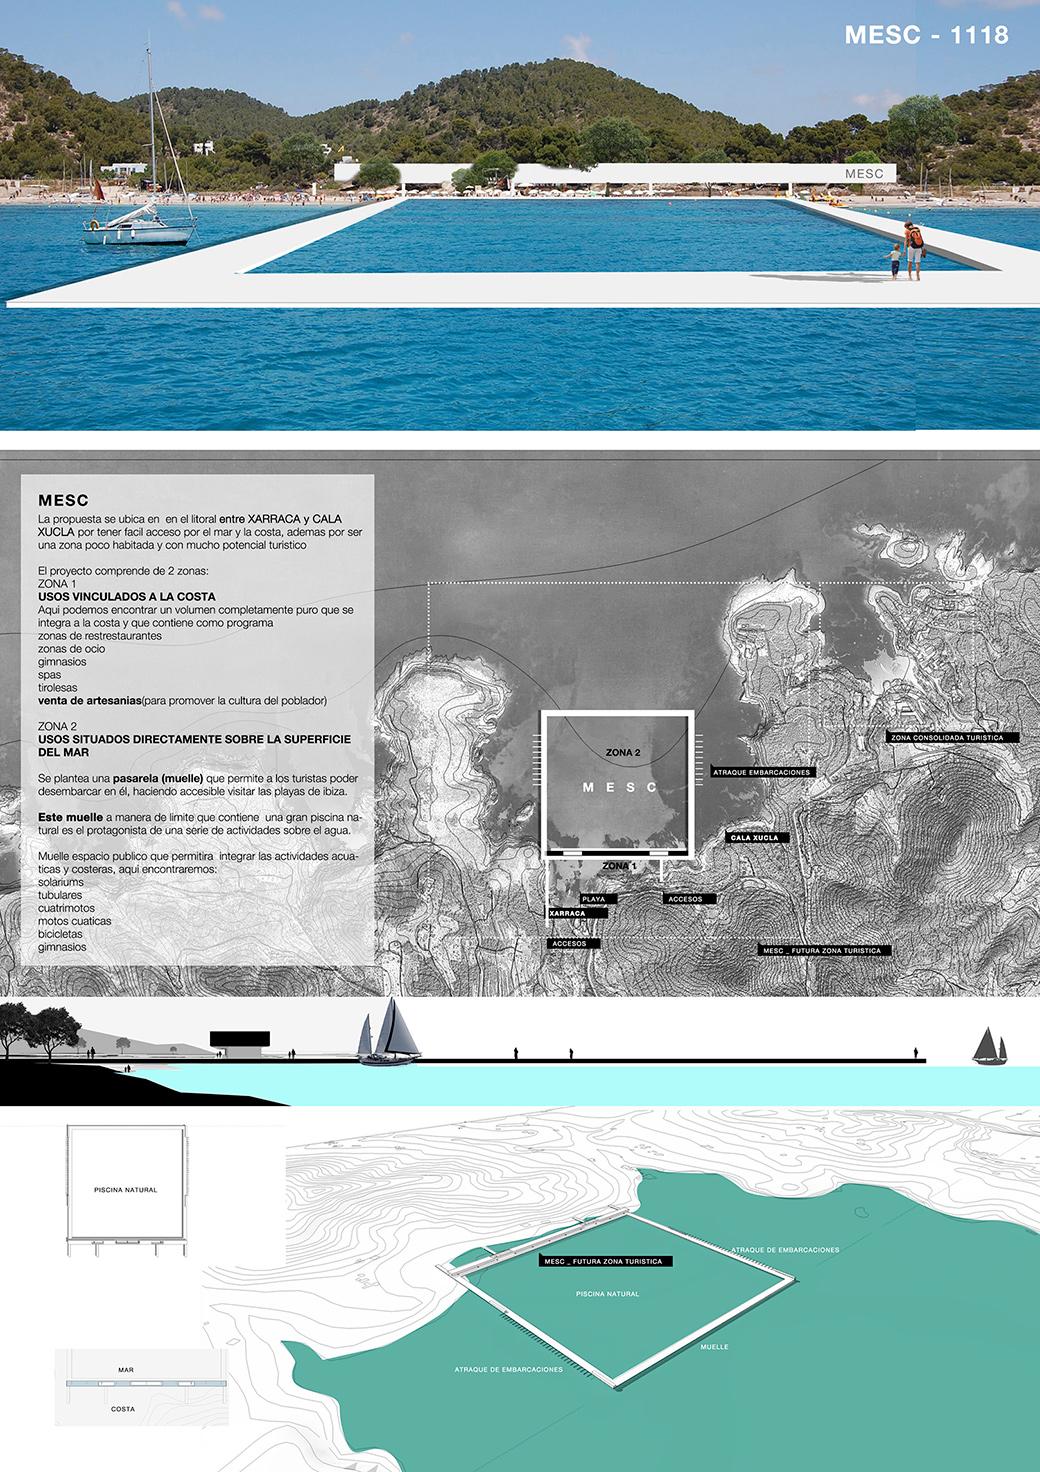 MESC 1118 Mediterranean Sea Club Mención Honorífica